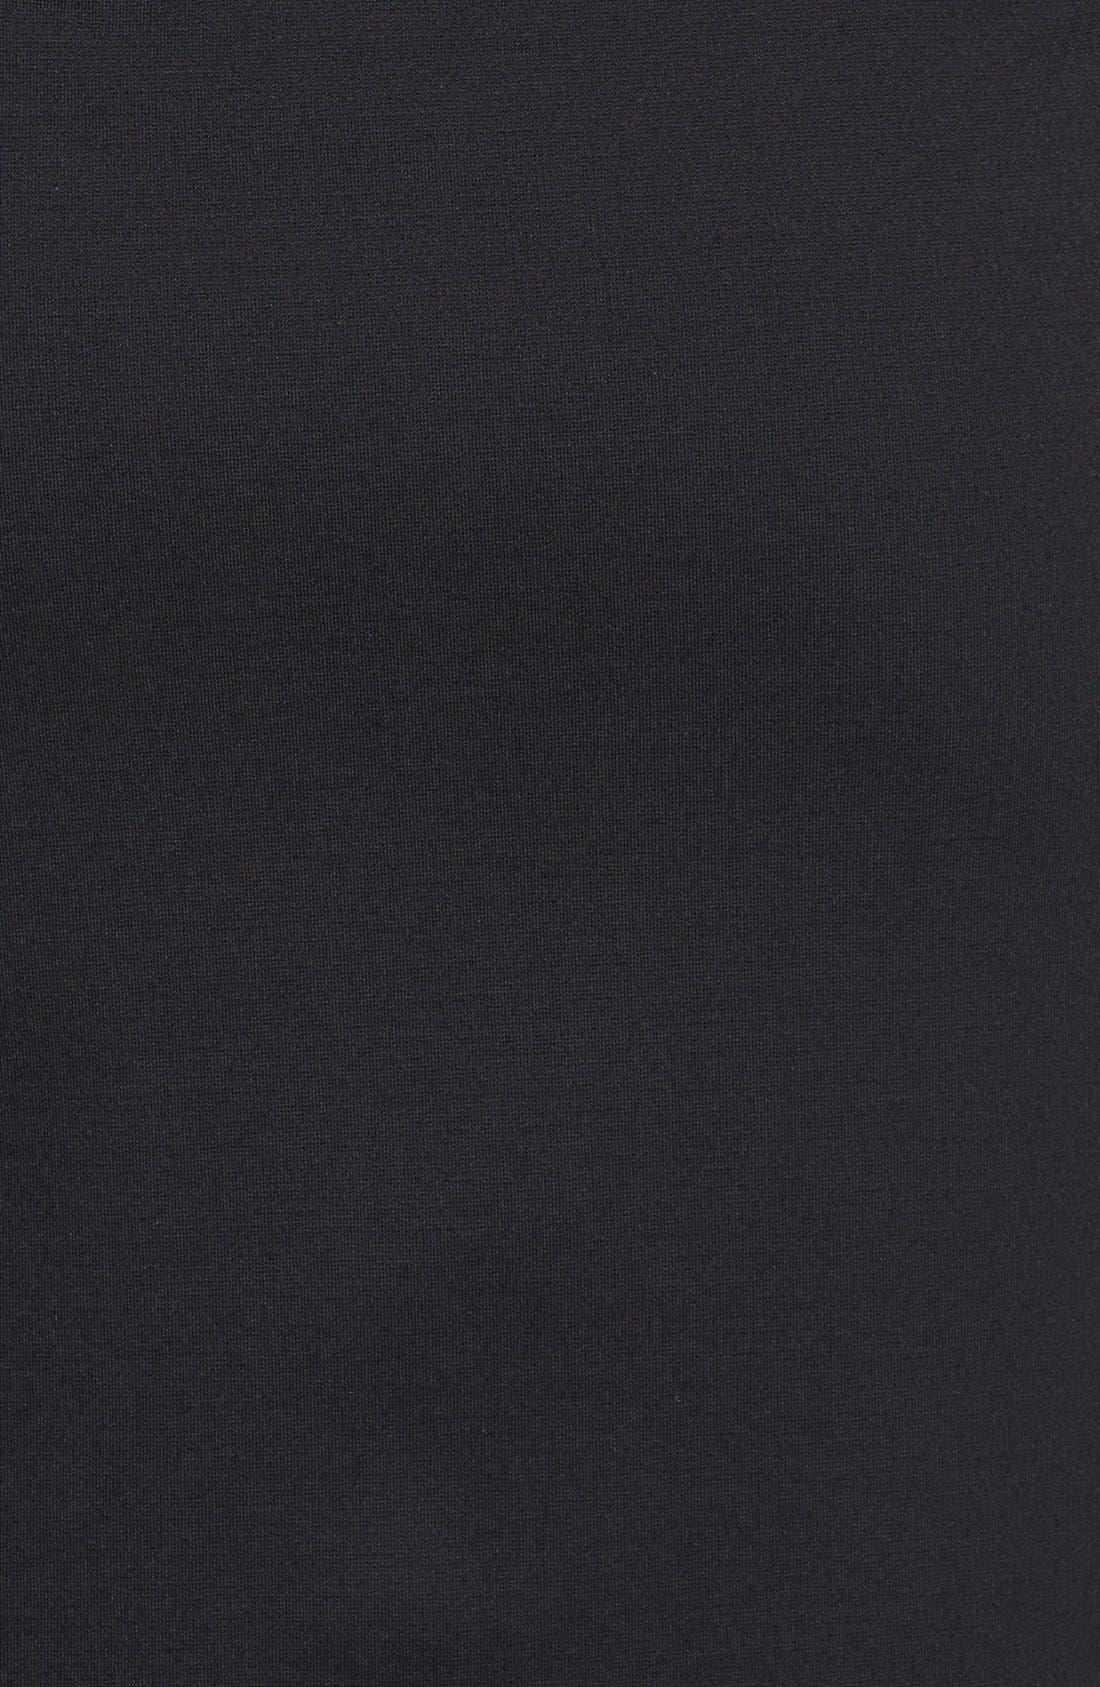 Alternate Image 3  - Ted Baker London 'Jamthun' Structured Peplum Cotton Blend Sheath Dress